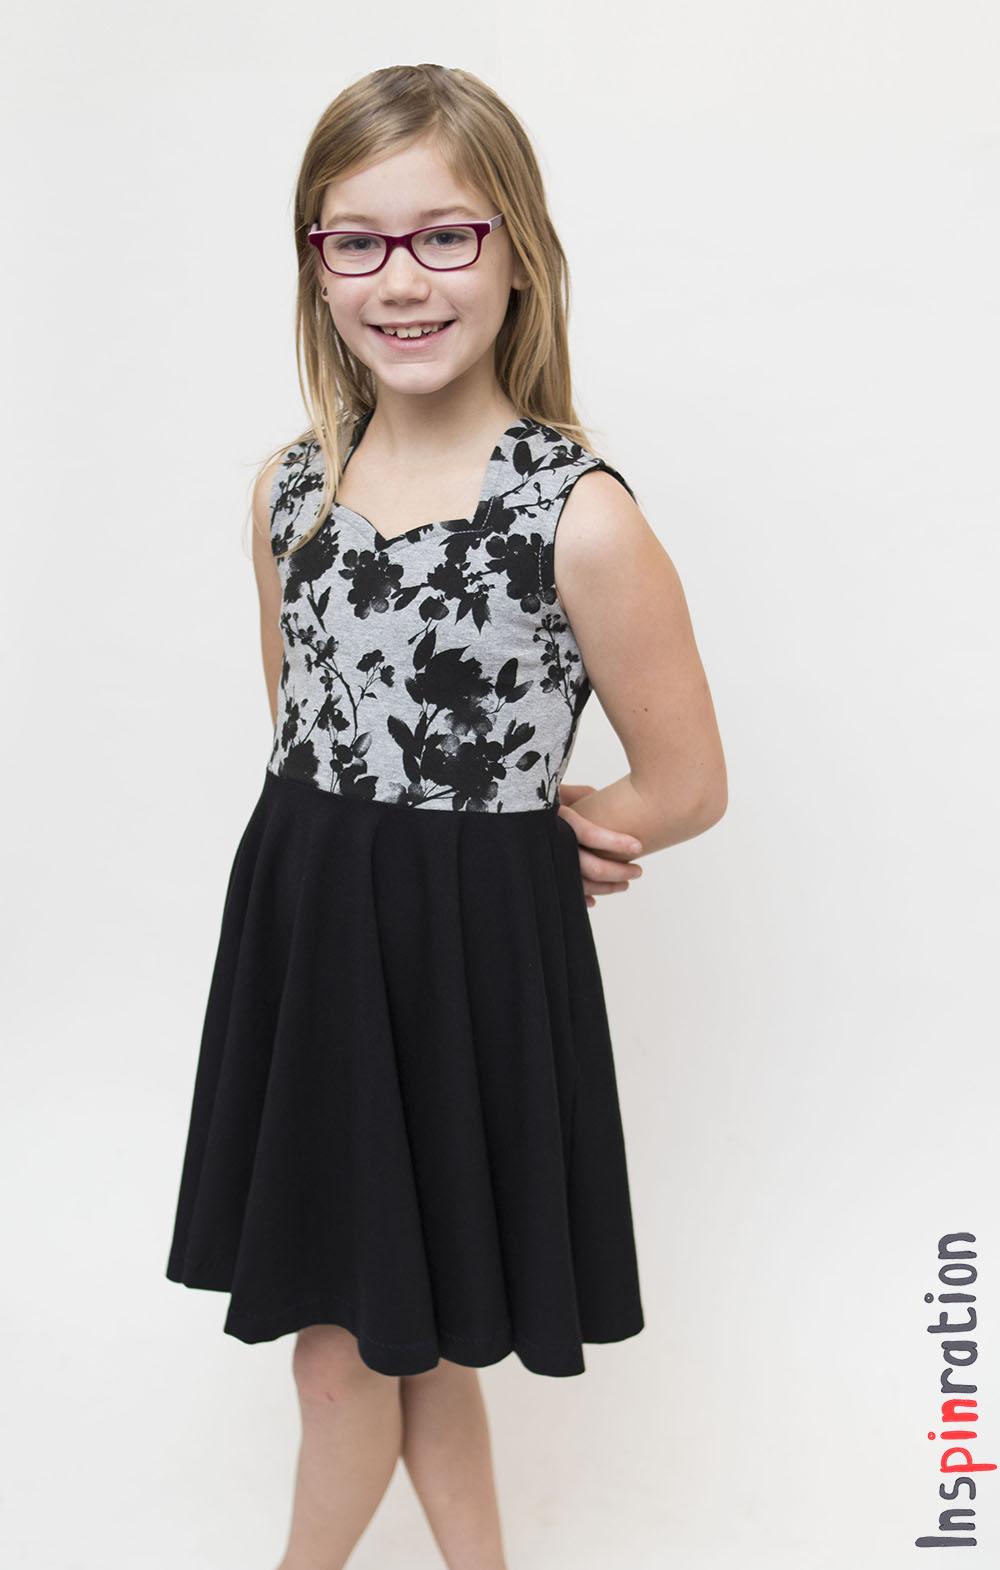 6683339424abde Inspinration  The Spirited Dress Blog Hop